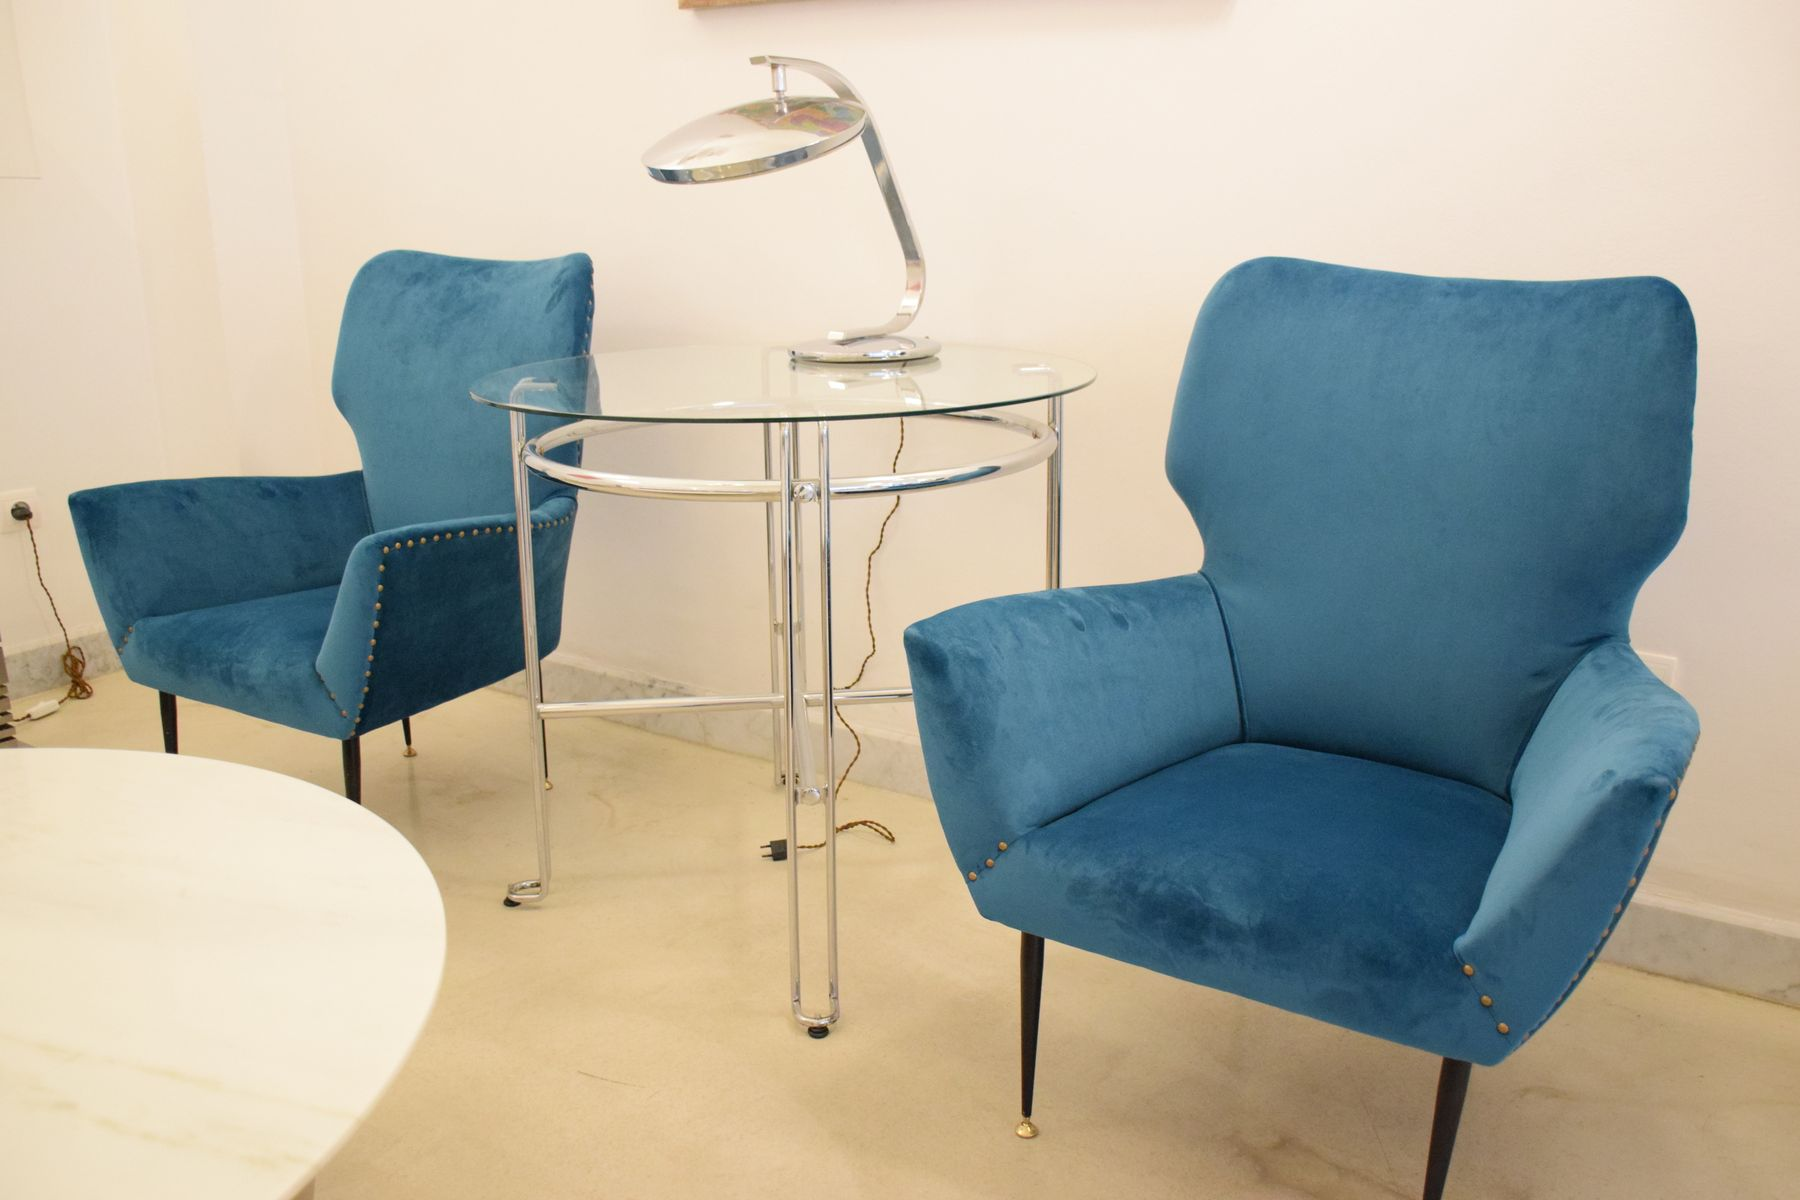 Geschwungene italienische sessel 1950er 2er set bei for Sessel italienisches design